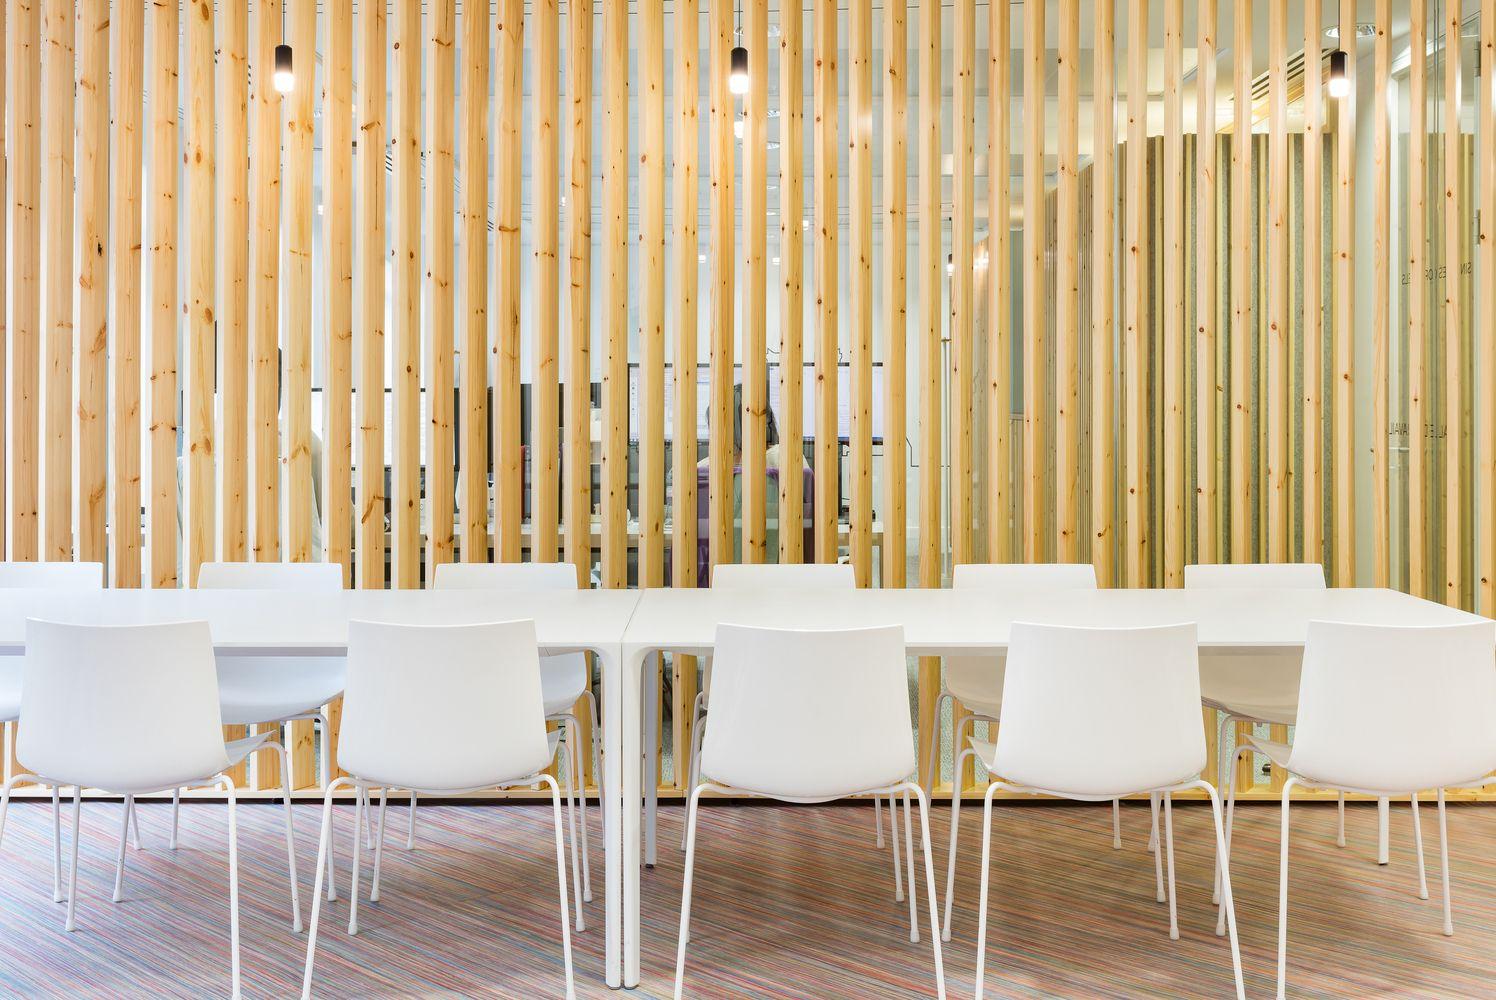 Gallery Of La Parisienne Hq Studio Razavi Architecture 11 En